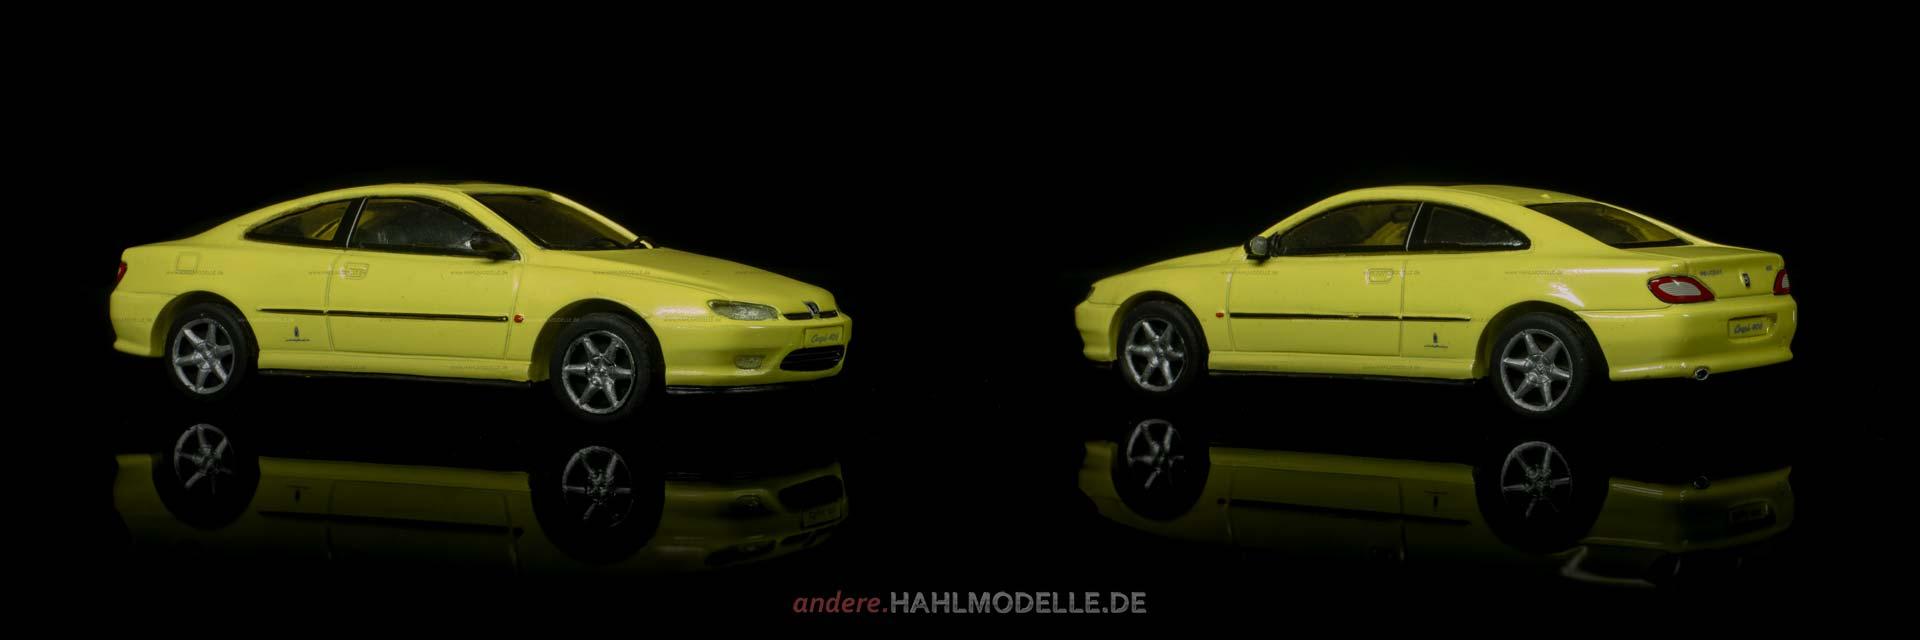 Peugeot 406 | Coupé | Starter | 1:43 | www.andere.hahlmodelle.de